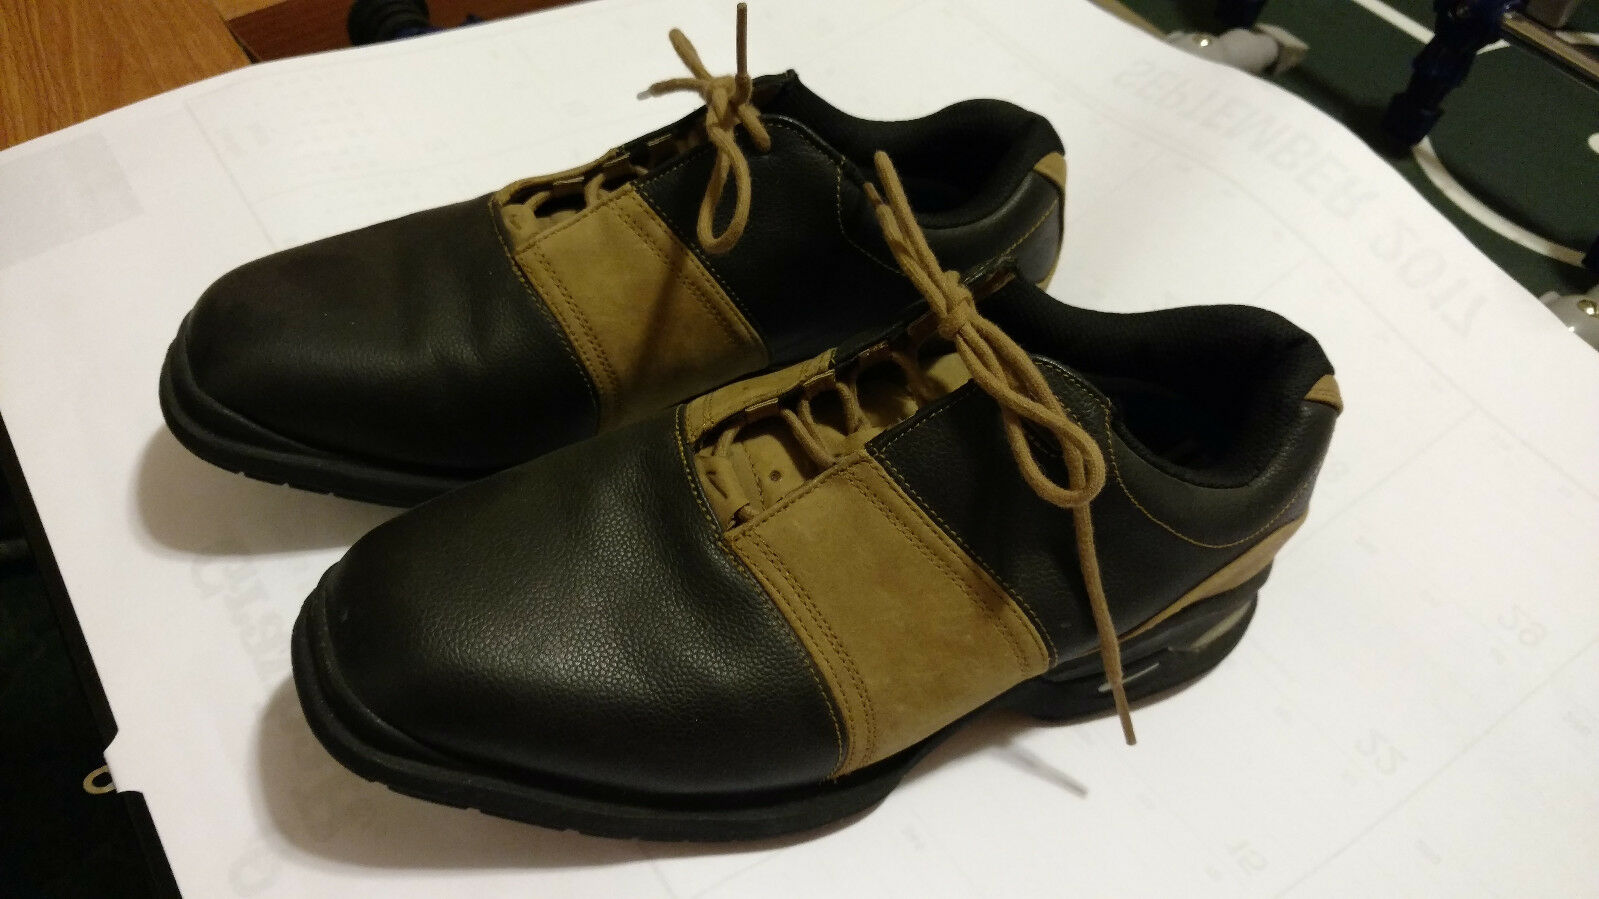 Men's Nike Tiger Woods Brown Saddler Golf Shoes Sz 7 *Very Nice* Seasonal clearance sale